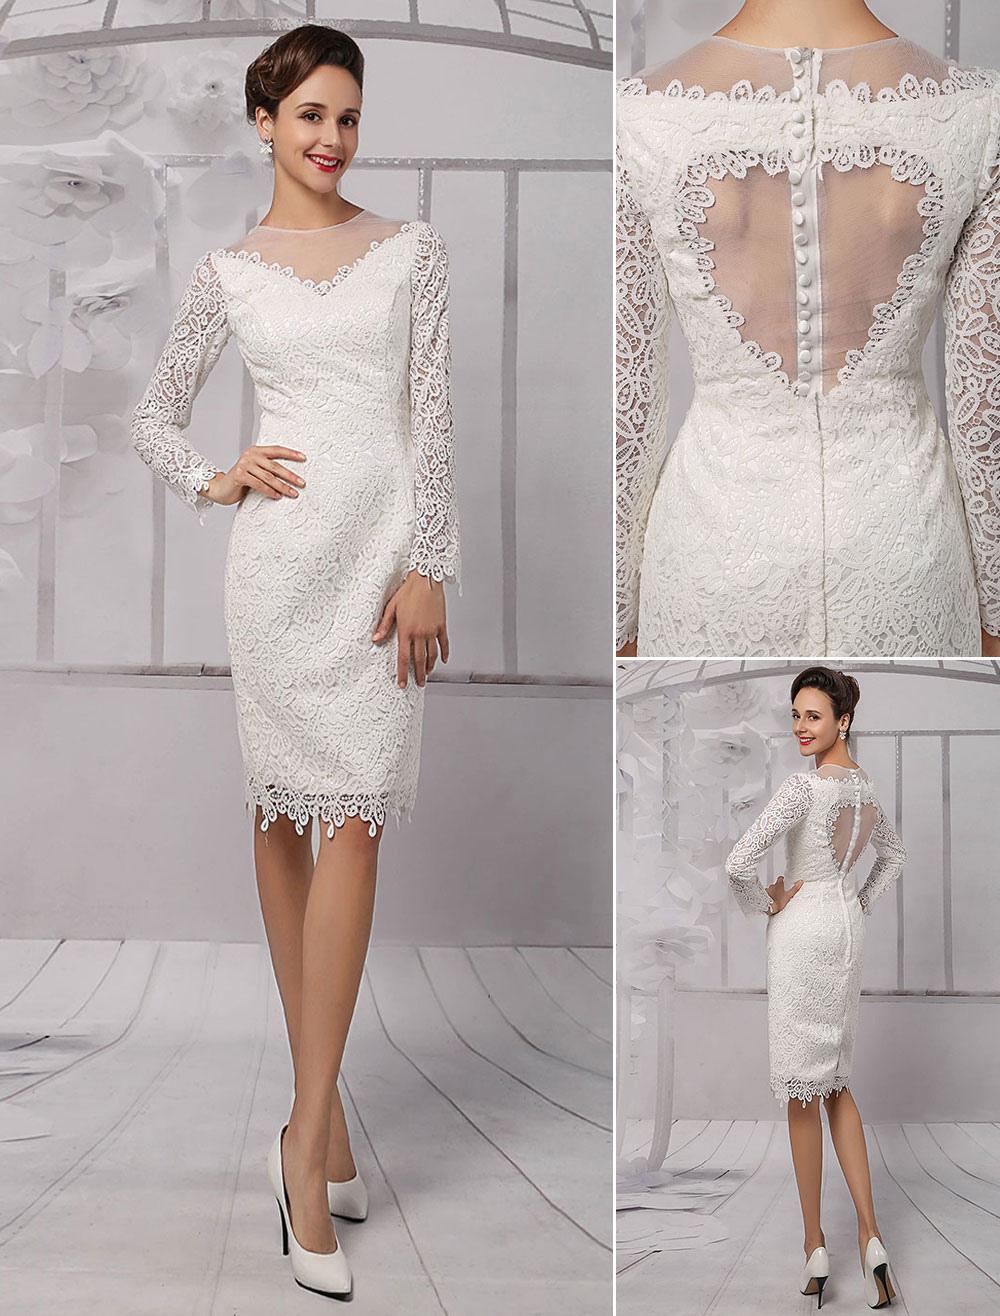 wedding dresses 2018 short long sleeve Illusion Neckline koyhole Knee length Sheath bridal Dress Milanoo (Cheap Wedding Dress) photo